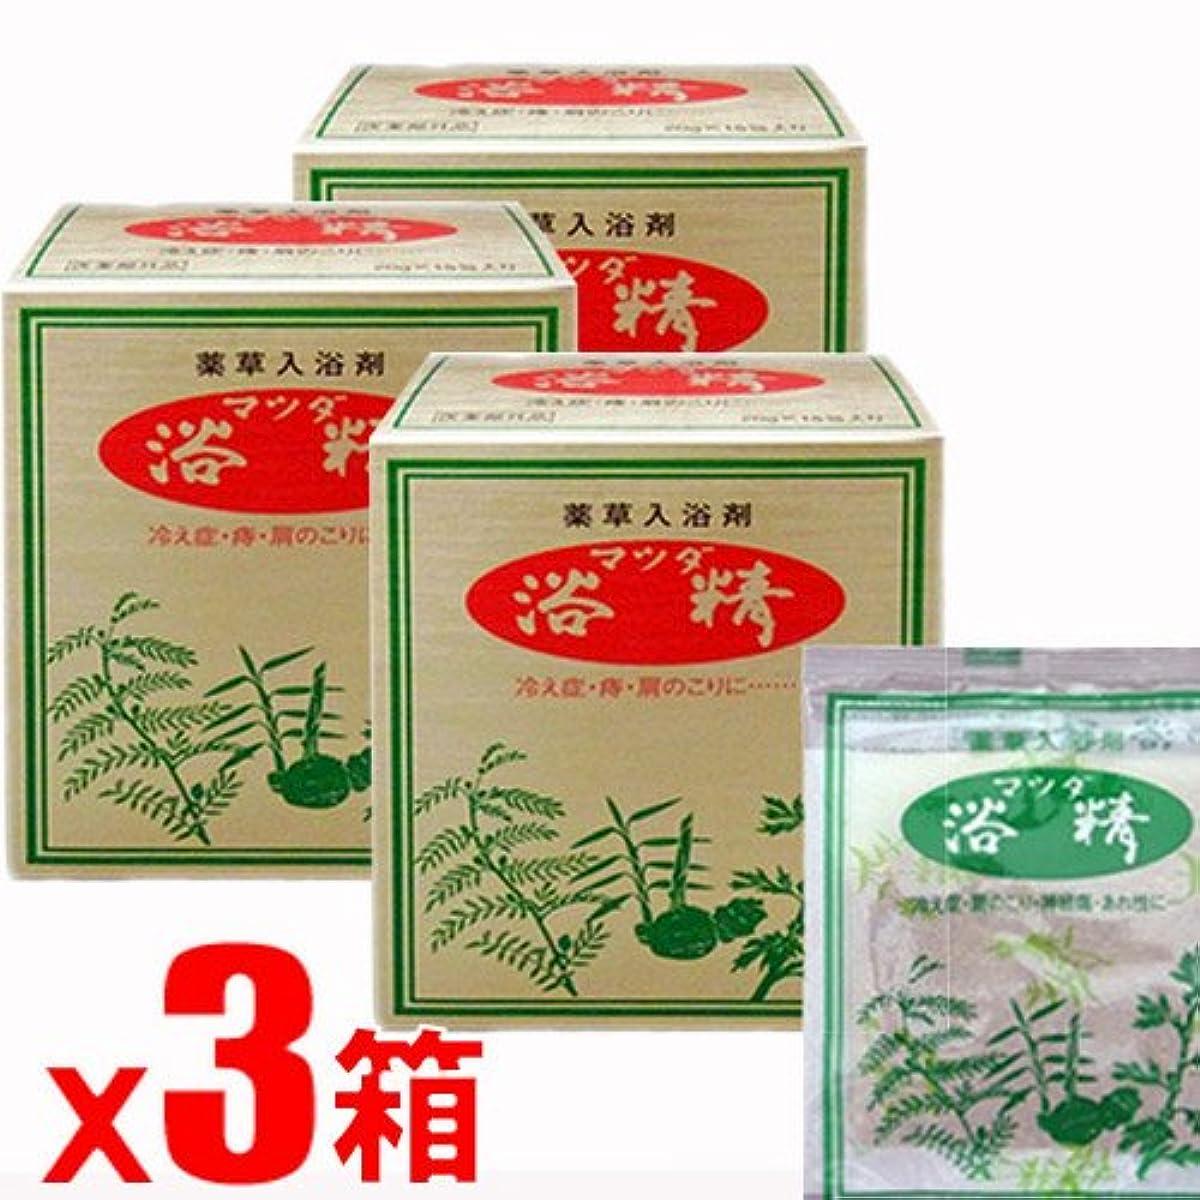 値する学期容器【3箱】薬草入浴剤 マツダ浴精 20g×15包x3箱(4962461435165-3)